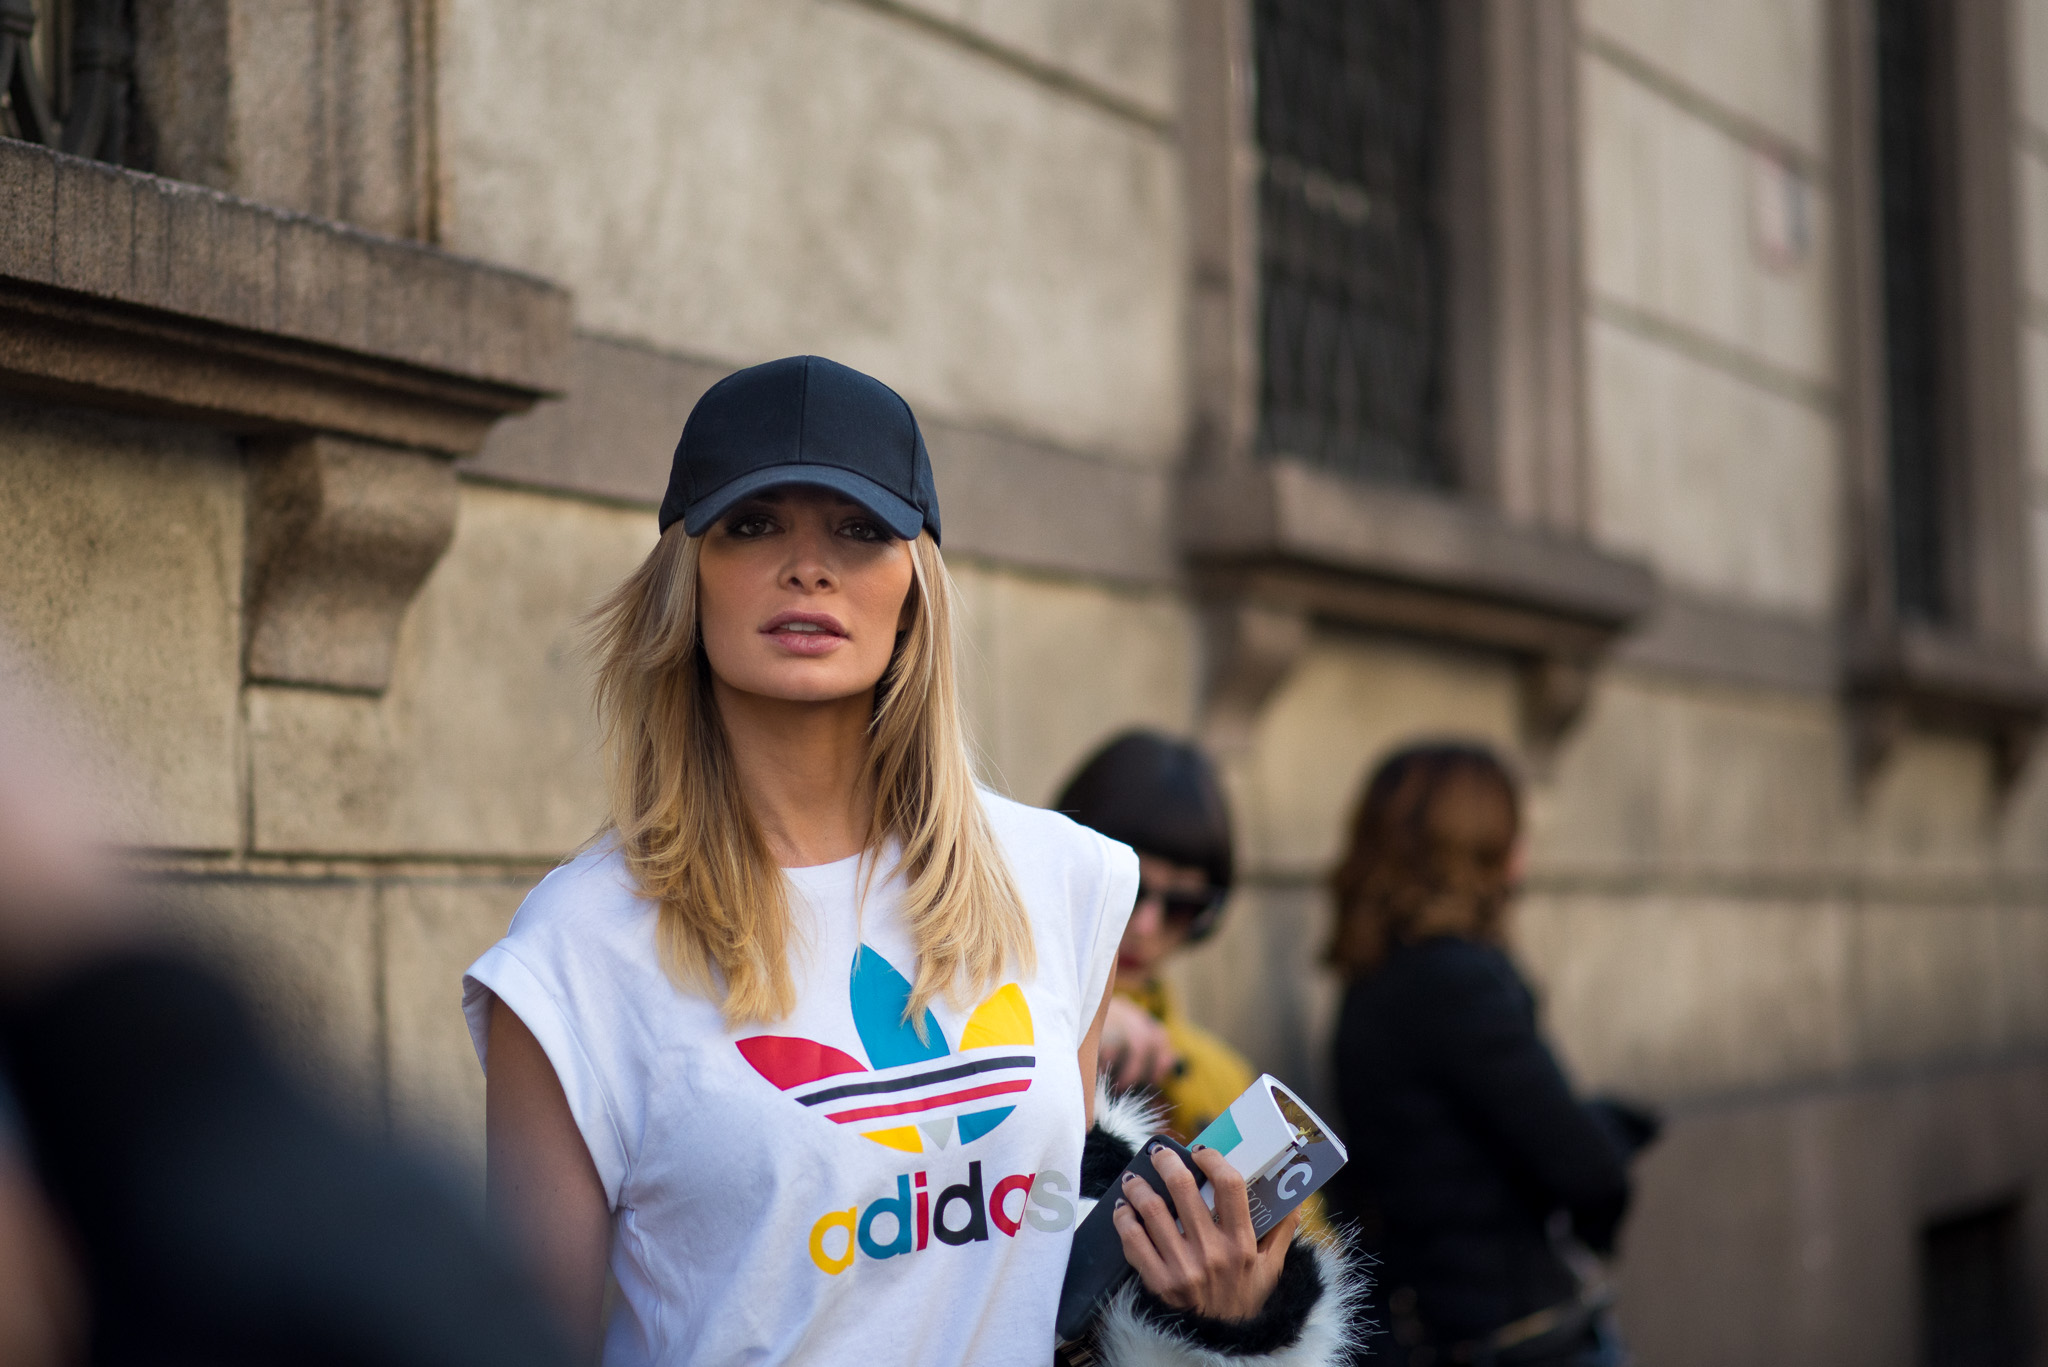 Leonora Jiménez, Street Style, outside Trussardi, Milan Fashion Week, February 26th 2017. Photography Annika Lagerqvist, www.annikasomething.com